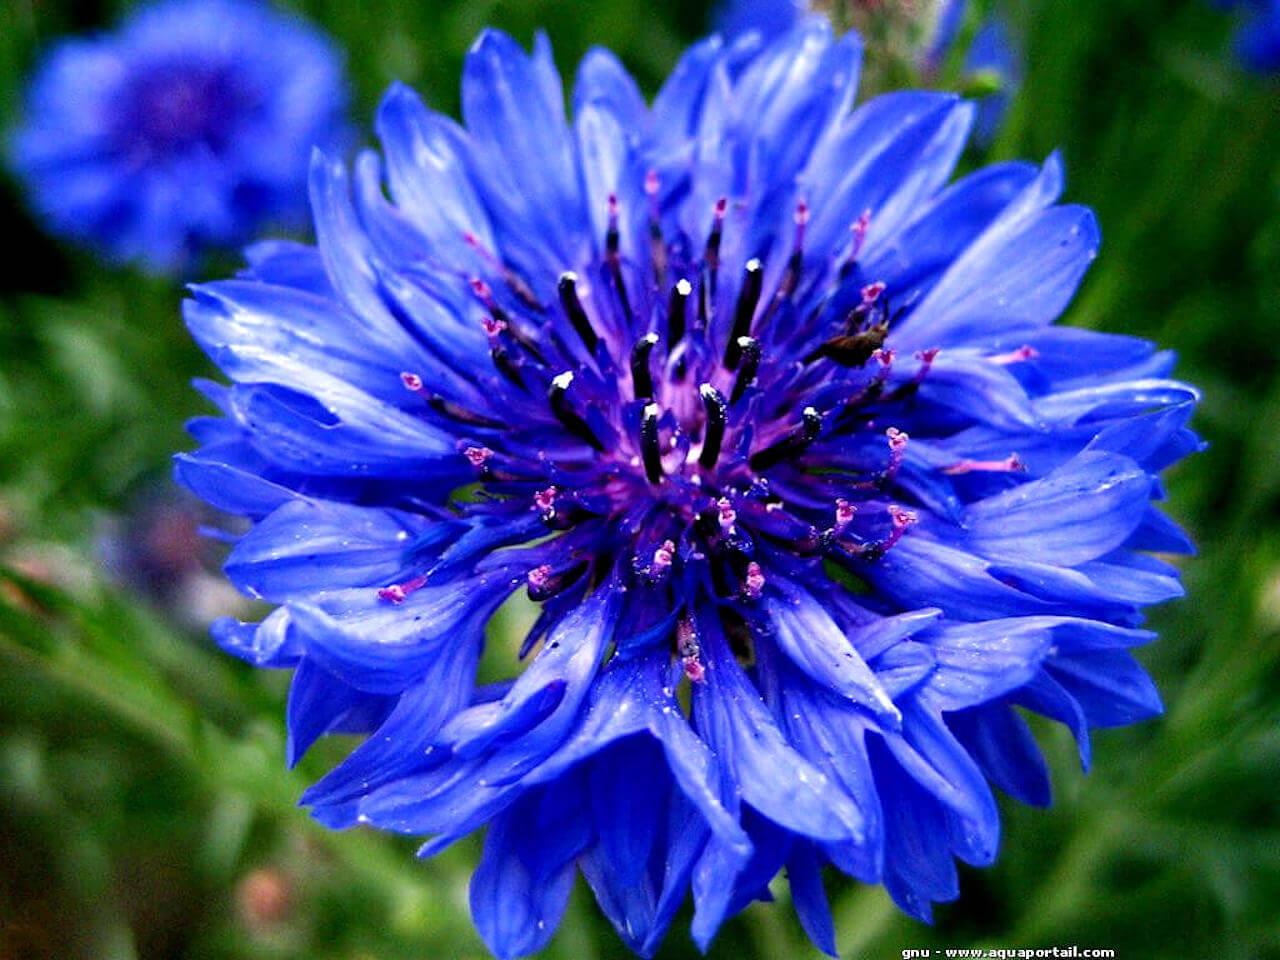 https://i1.wp.com/www.aquaportail.com/pictures1106/anemone-clown_1307889811-fleur.jpg